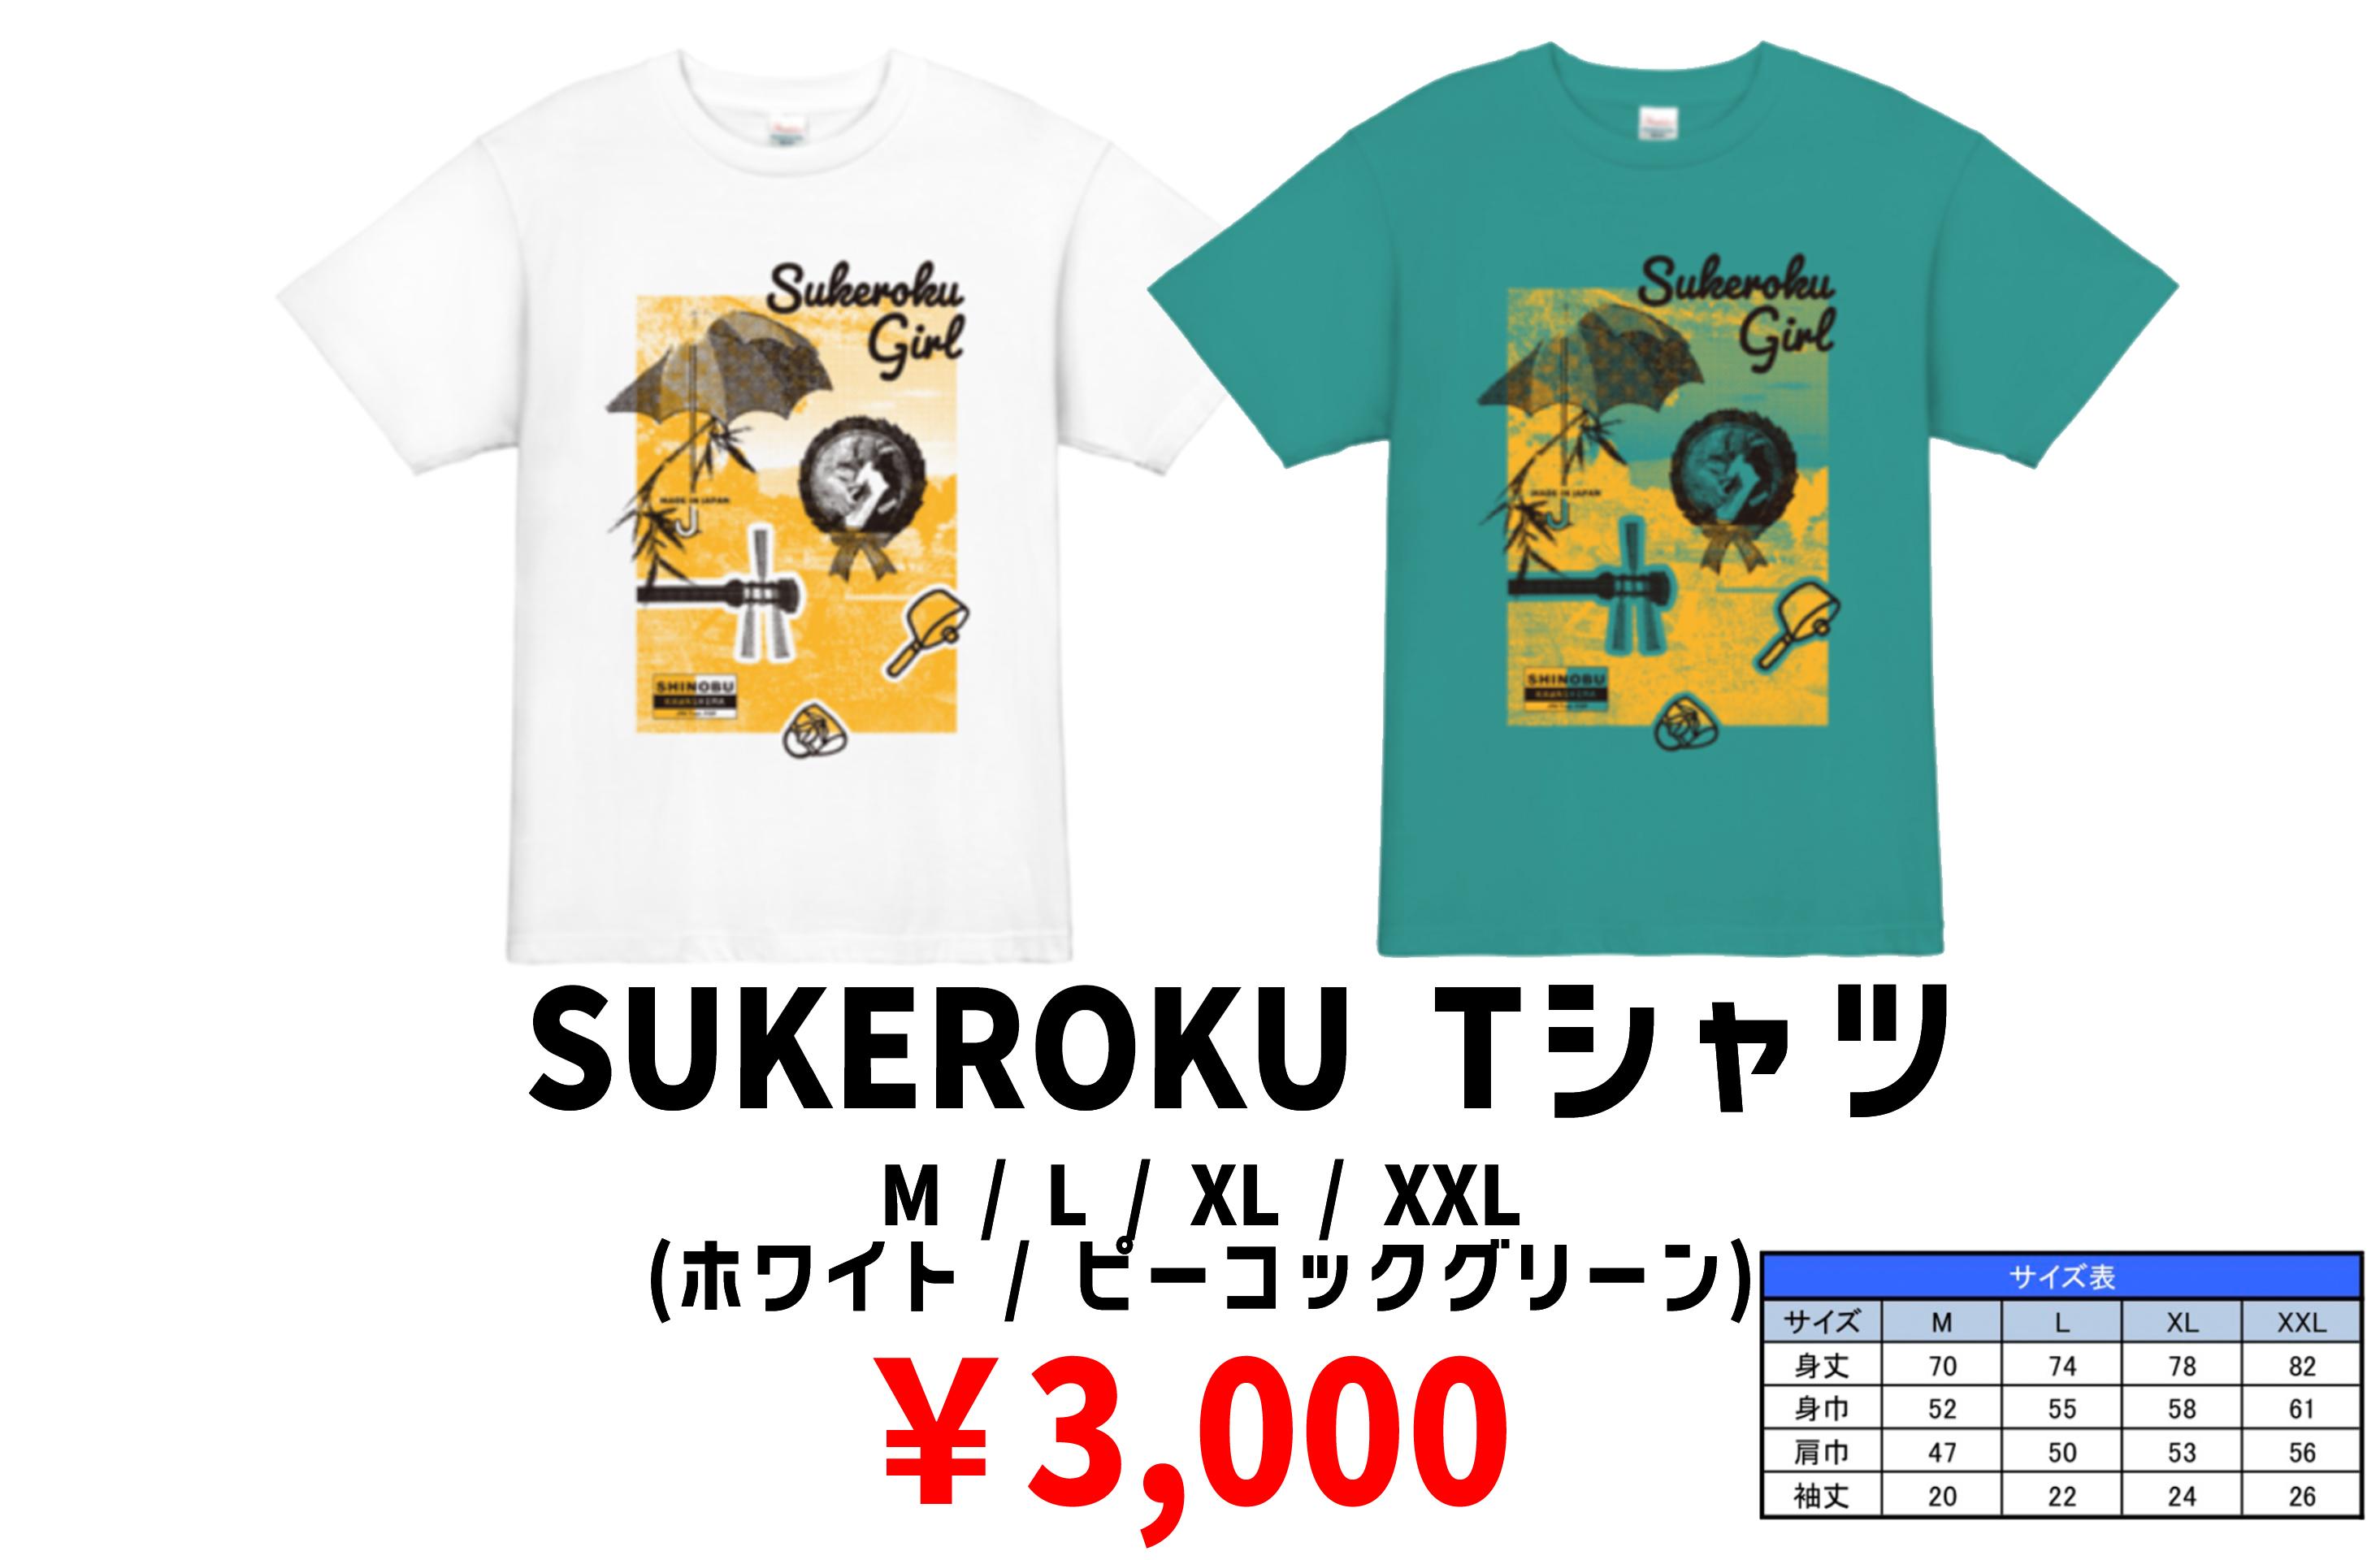 SUKEROKU Tシャツ